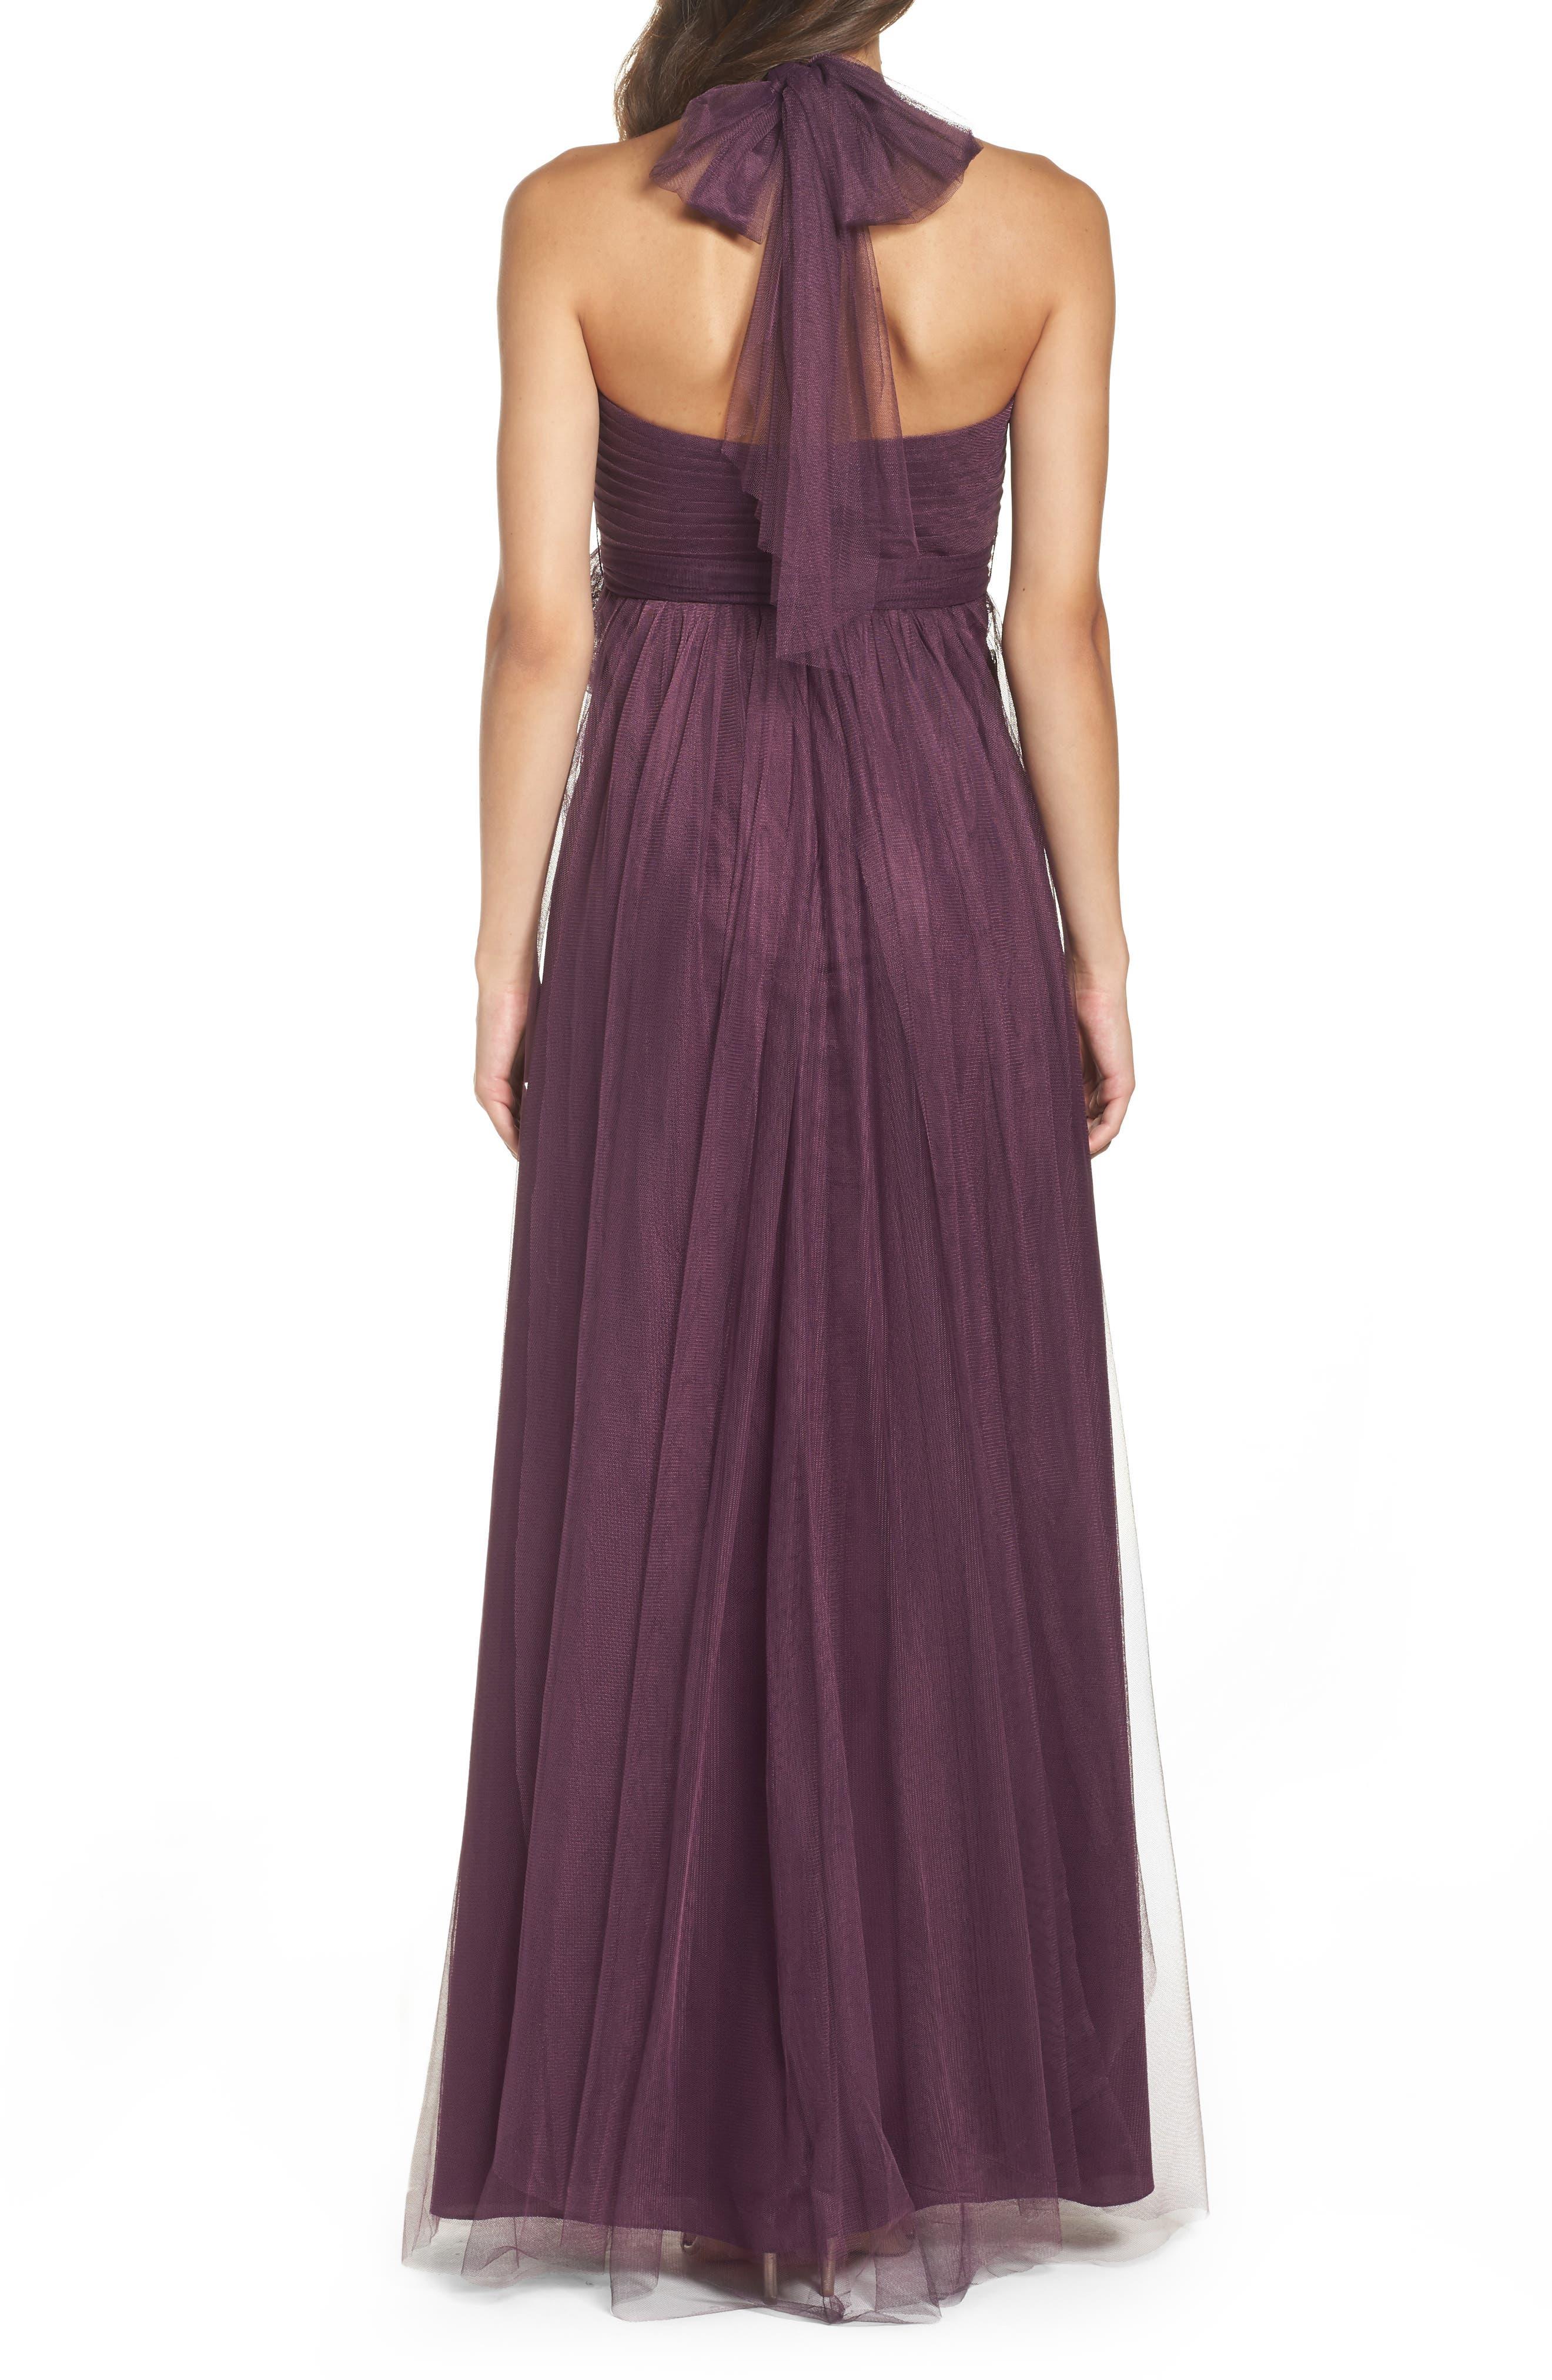 Annabelle Convertible Tulle Column Dress,                             Alternate thumbnail 2, color,                             Raisin